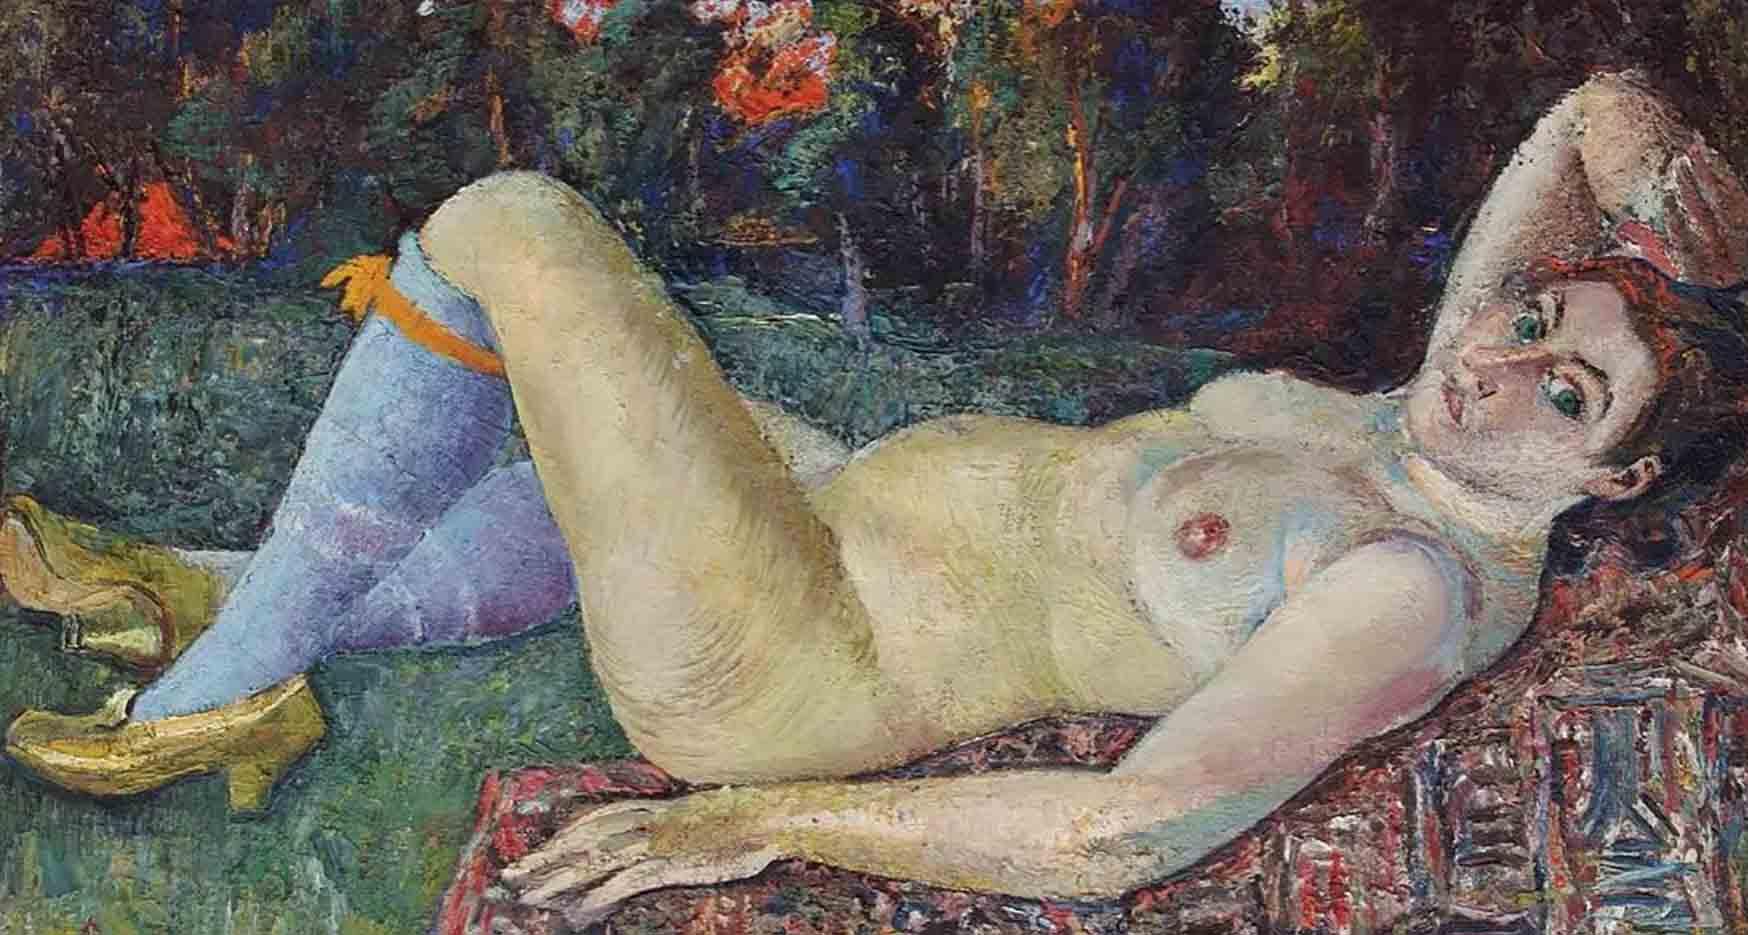 "Давид Бурлюк (David Burliuk) ""Этюд обнаженной женской натуры | Study of a nude female nature"""